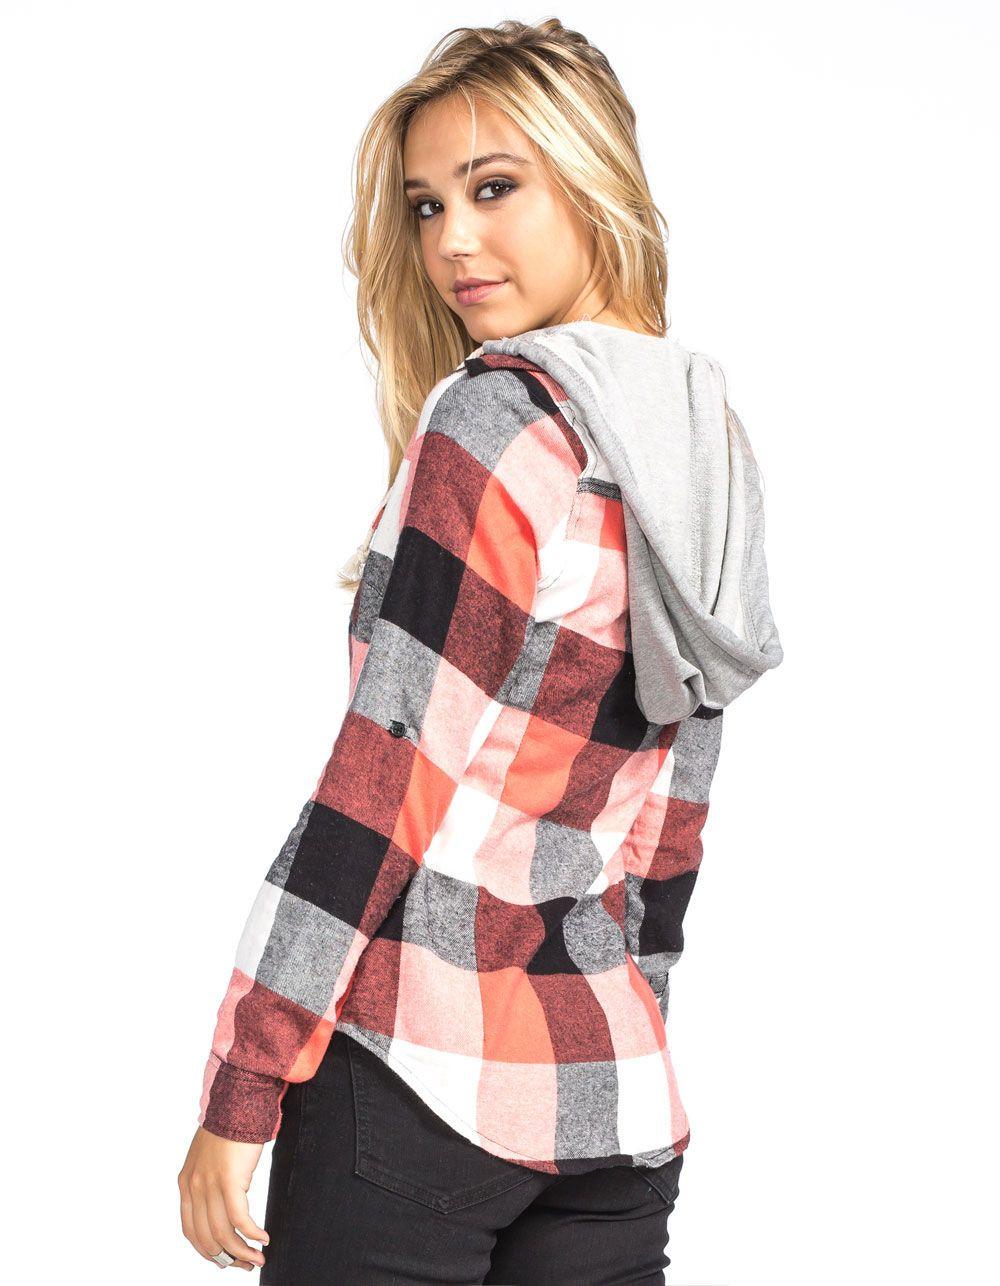 Flannel dress womens  FULL TILT Buffalo Womens Hooded Flannel Shirt   Flannels